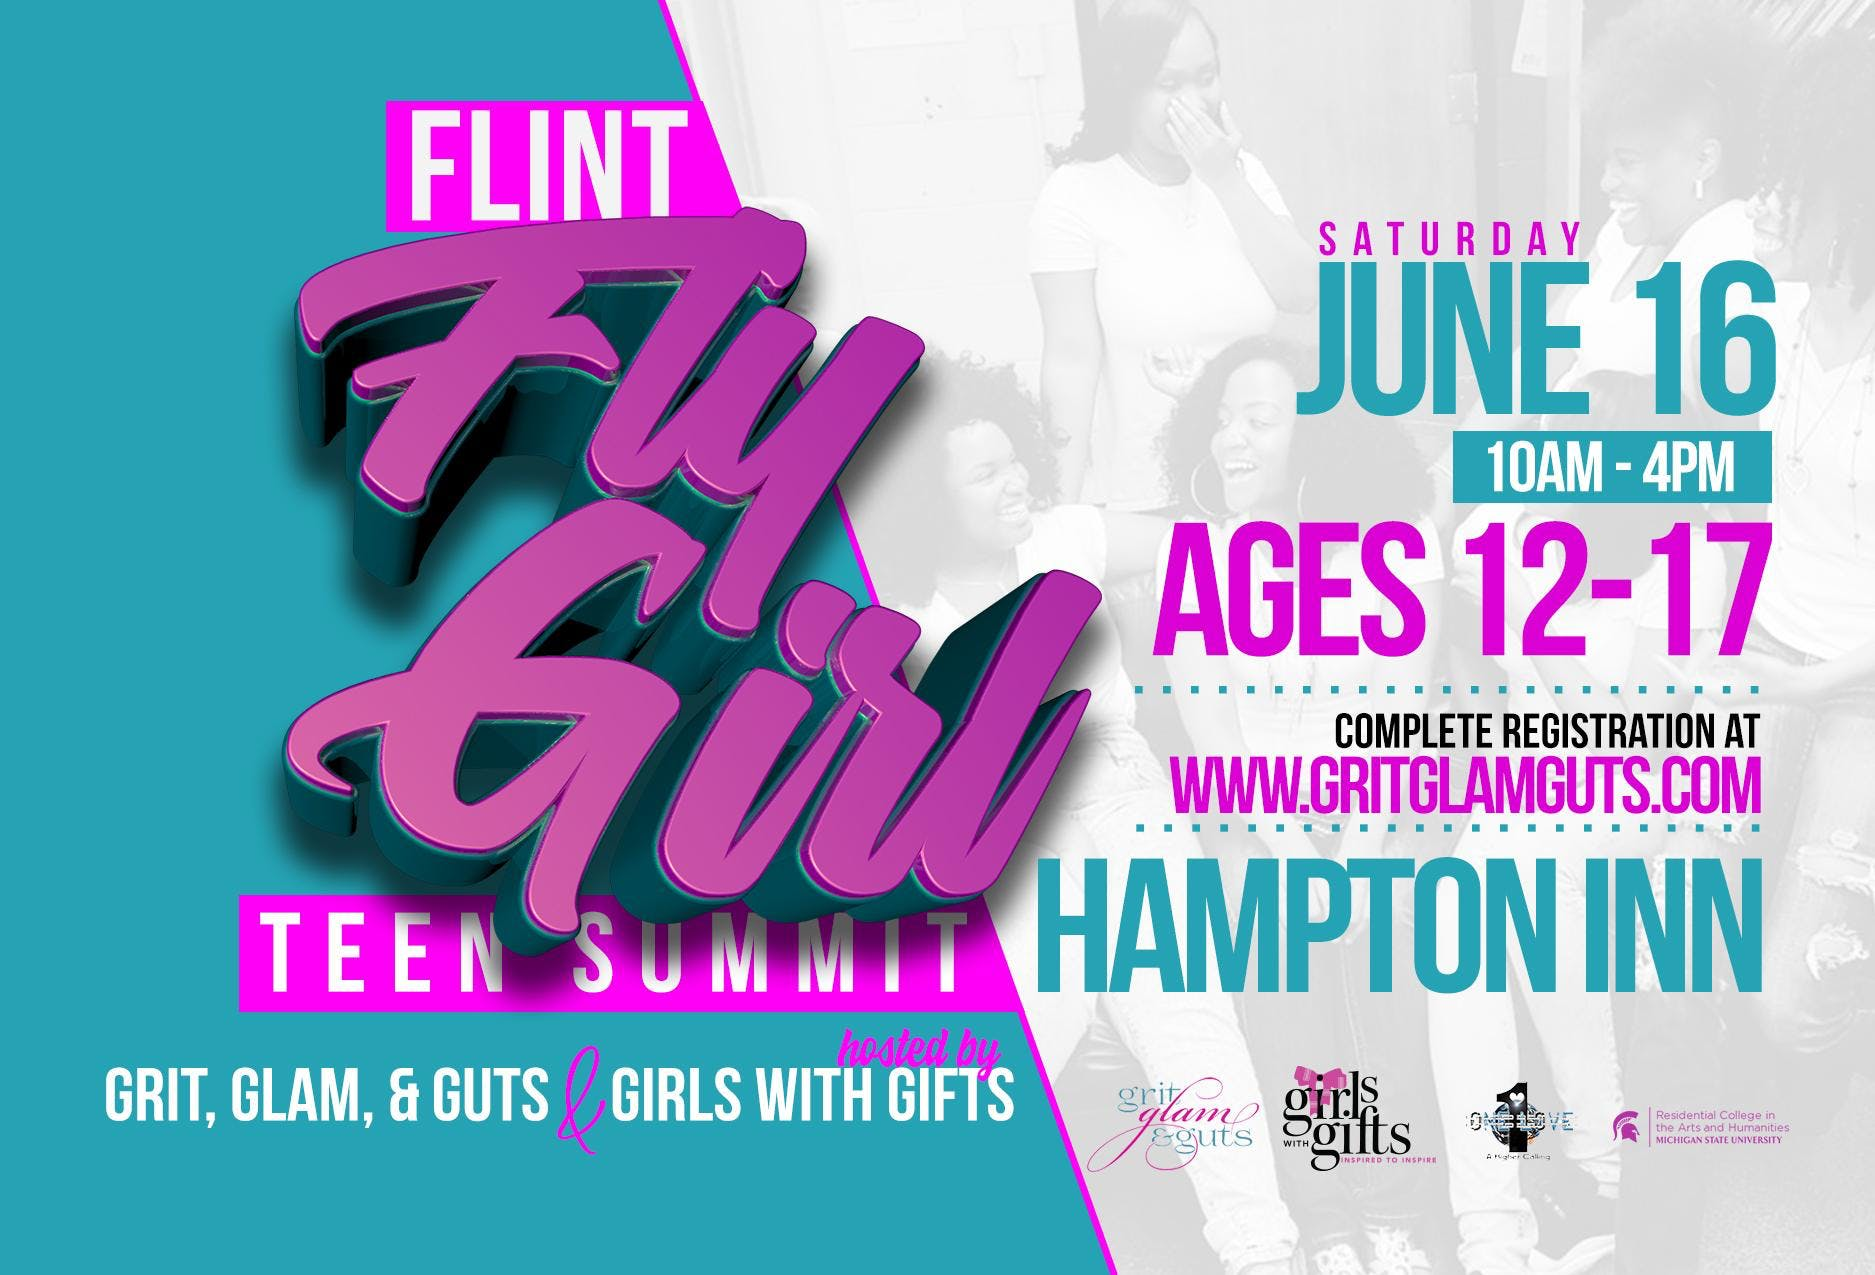 Flint Fly Girl